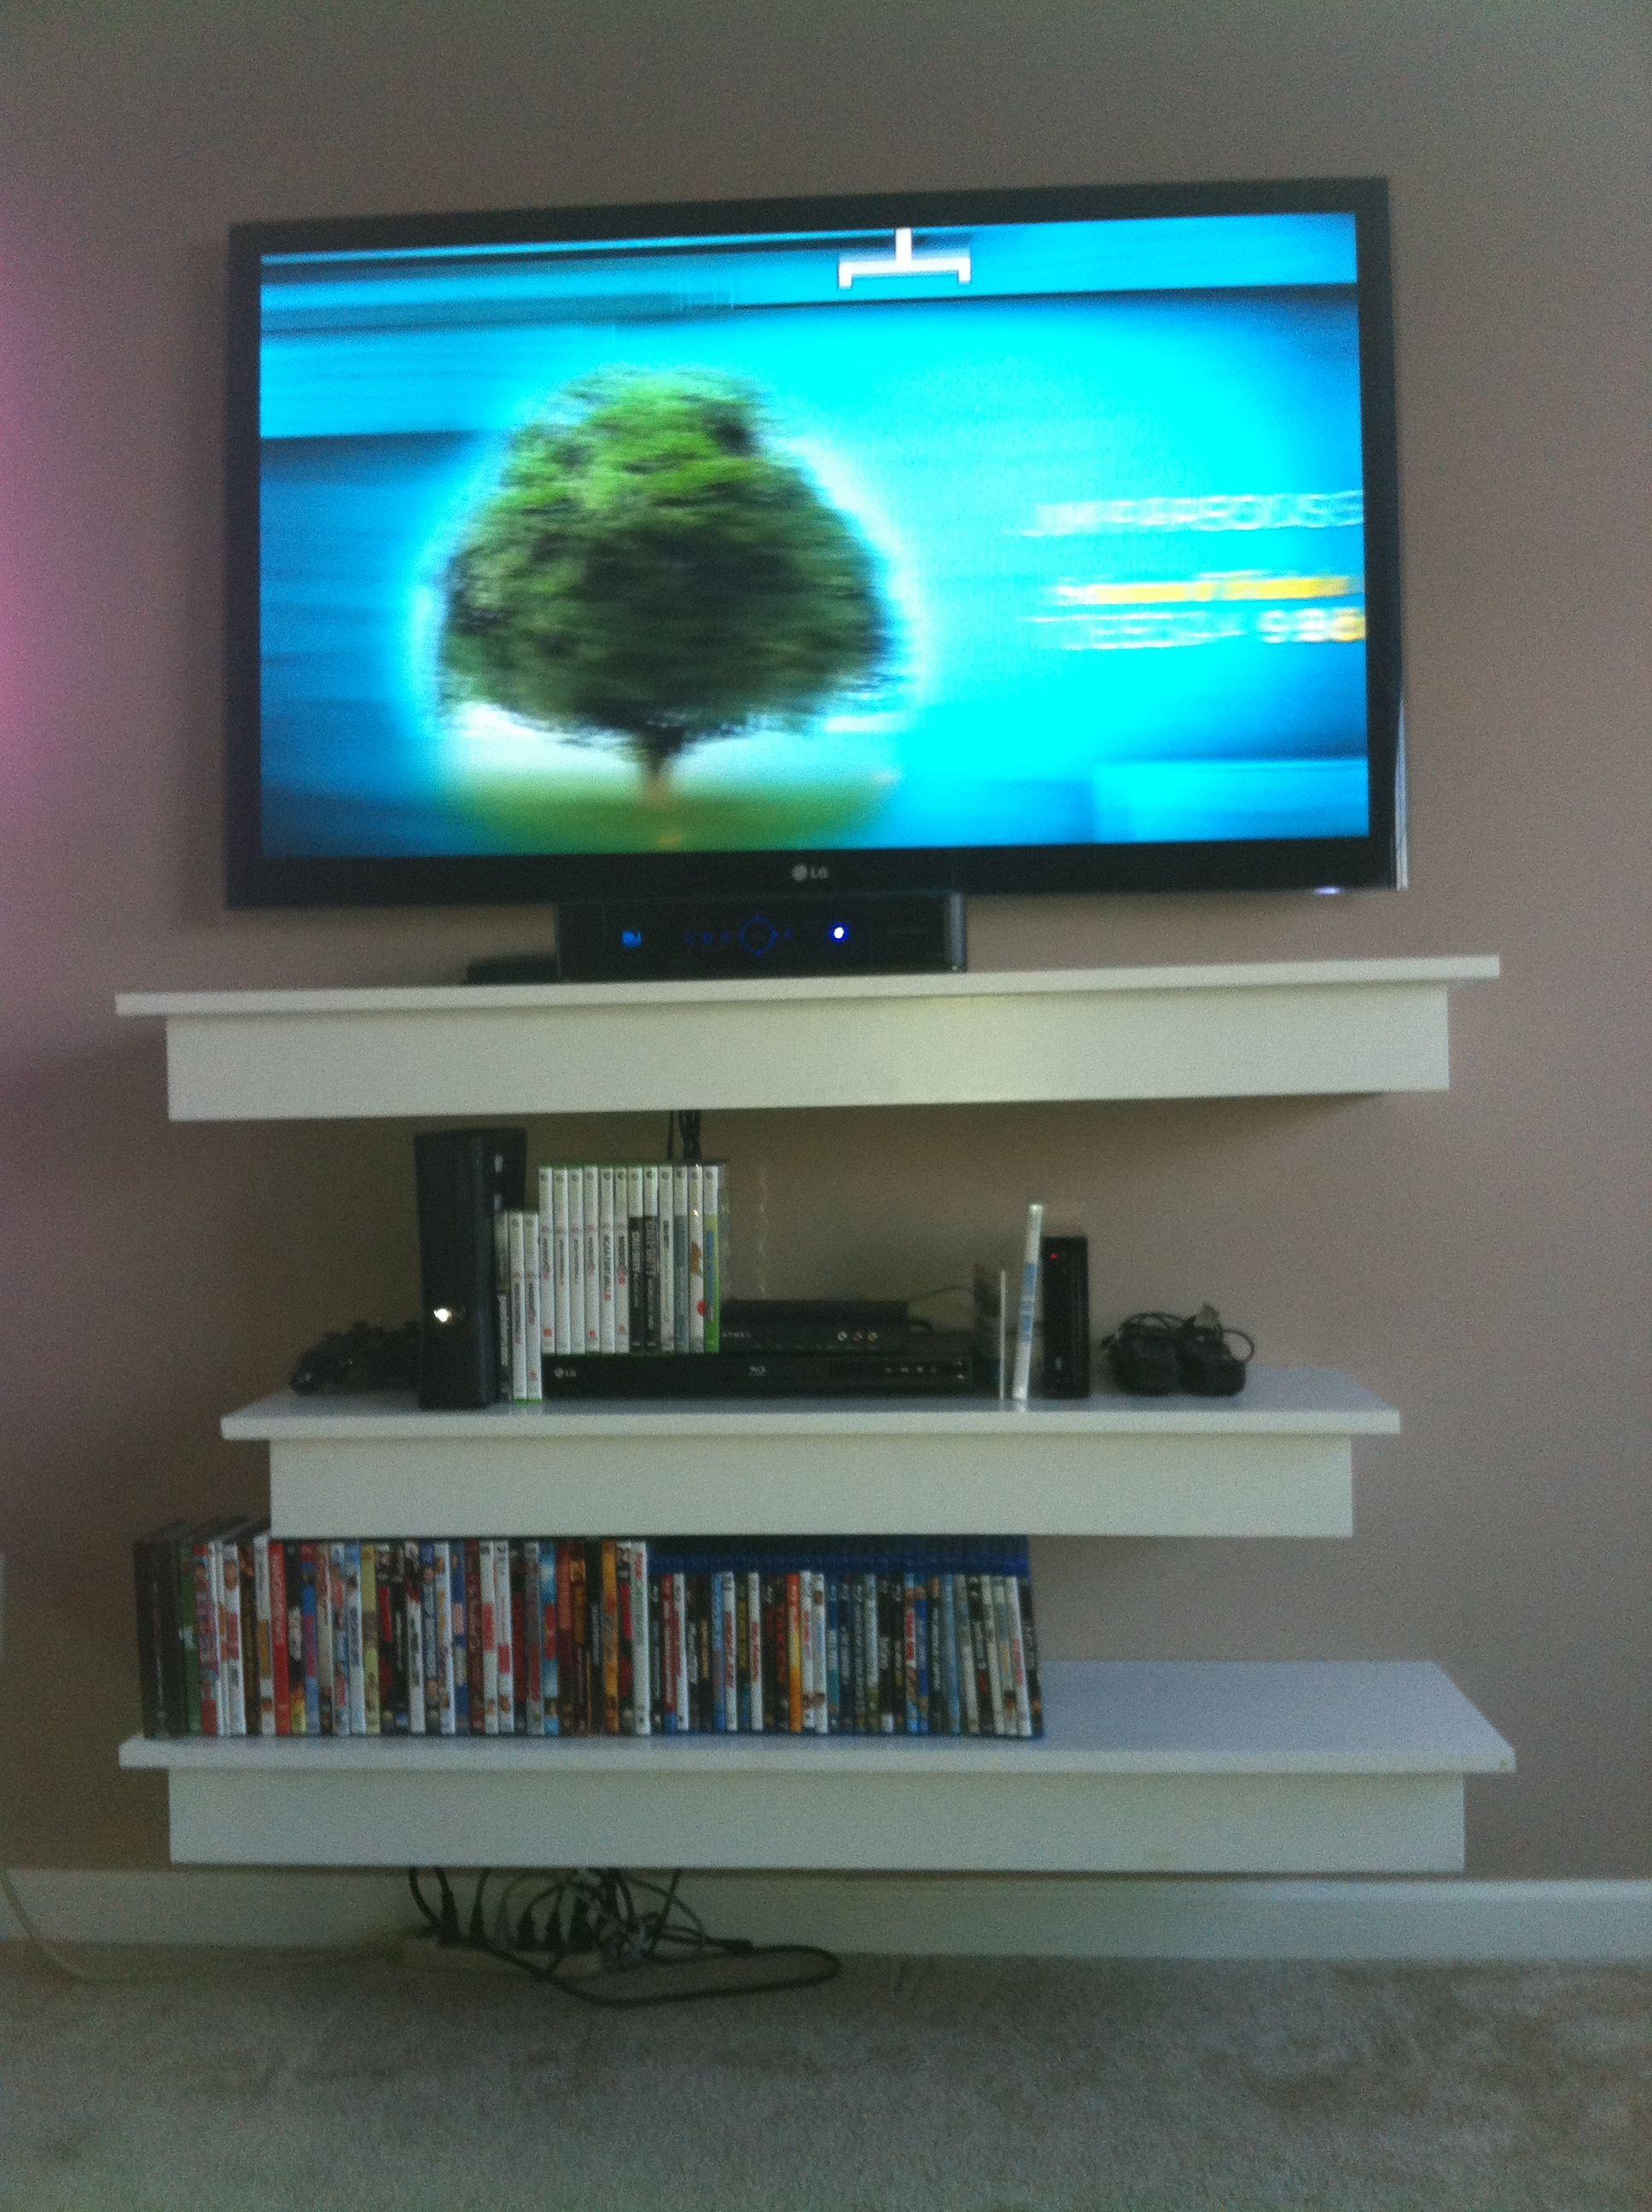 Pin By Brandy Denham On Home Decor Floating Shelf Under Tv Floating Shelves Bedroom Floating Shelves Diy